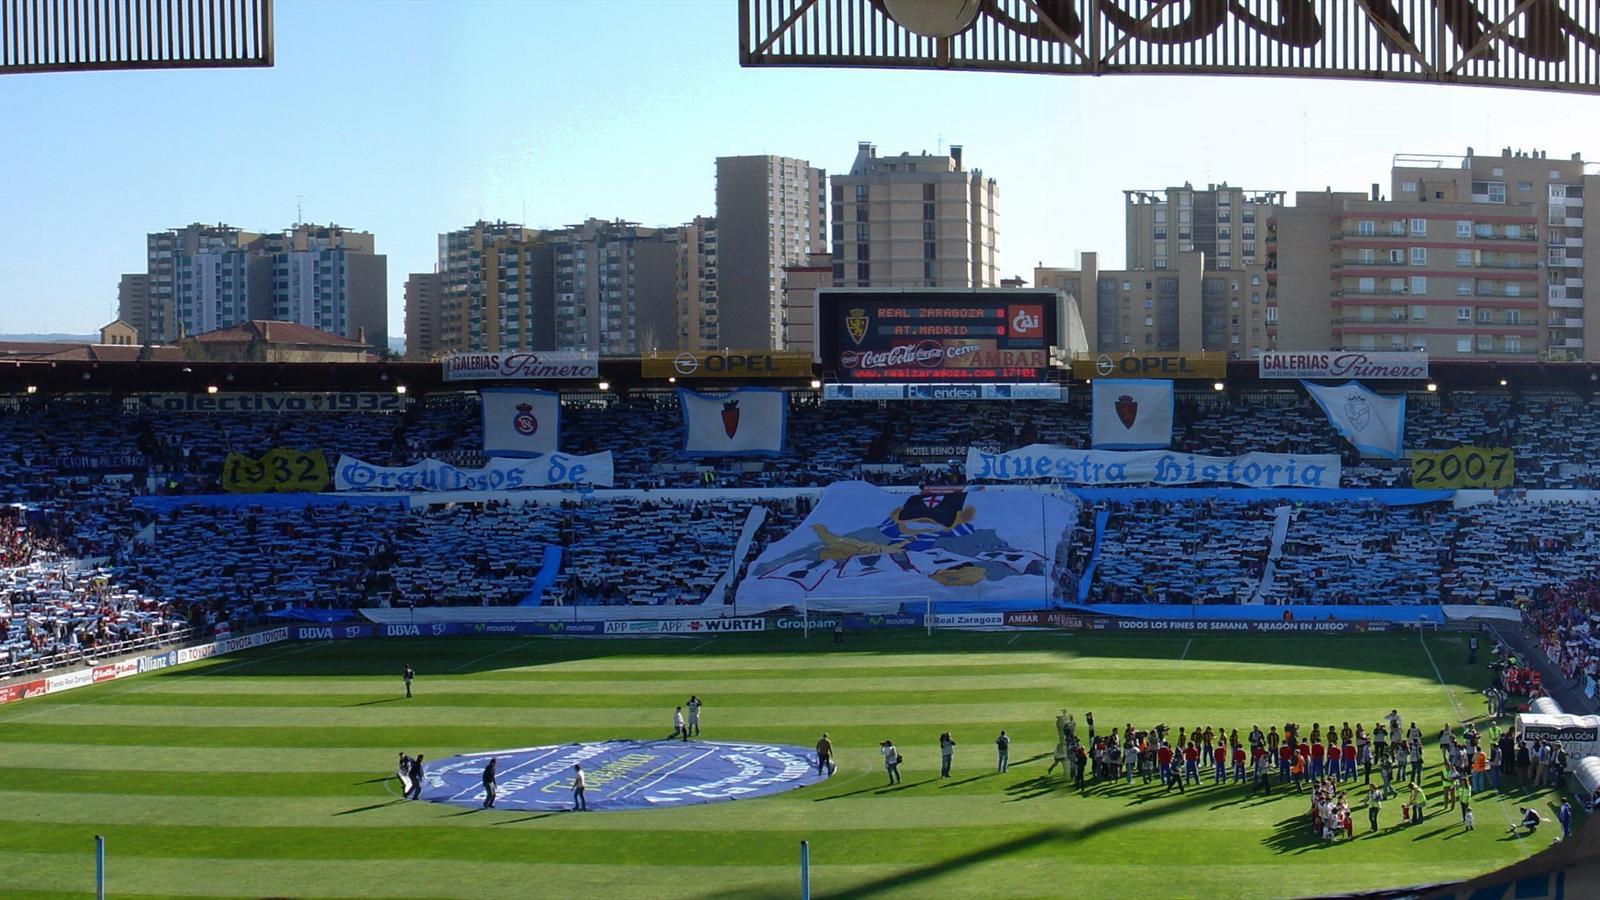 Real Zaragoza - UD Almería Canlı Skor, Maç Sonucu - İspanya 2 ... - Eurosport.com.tr